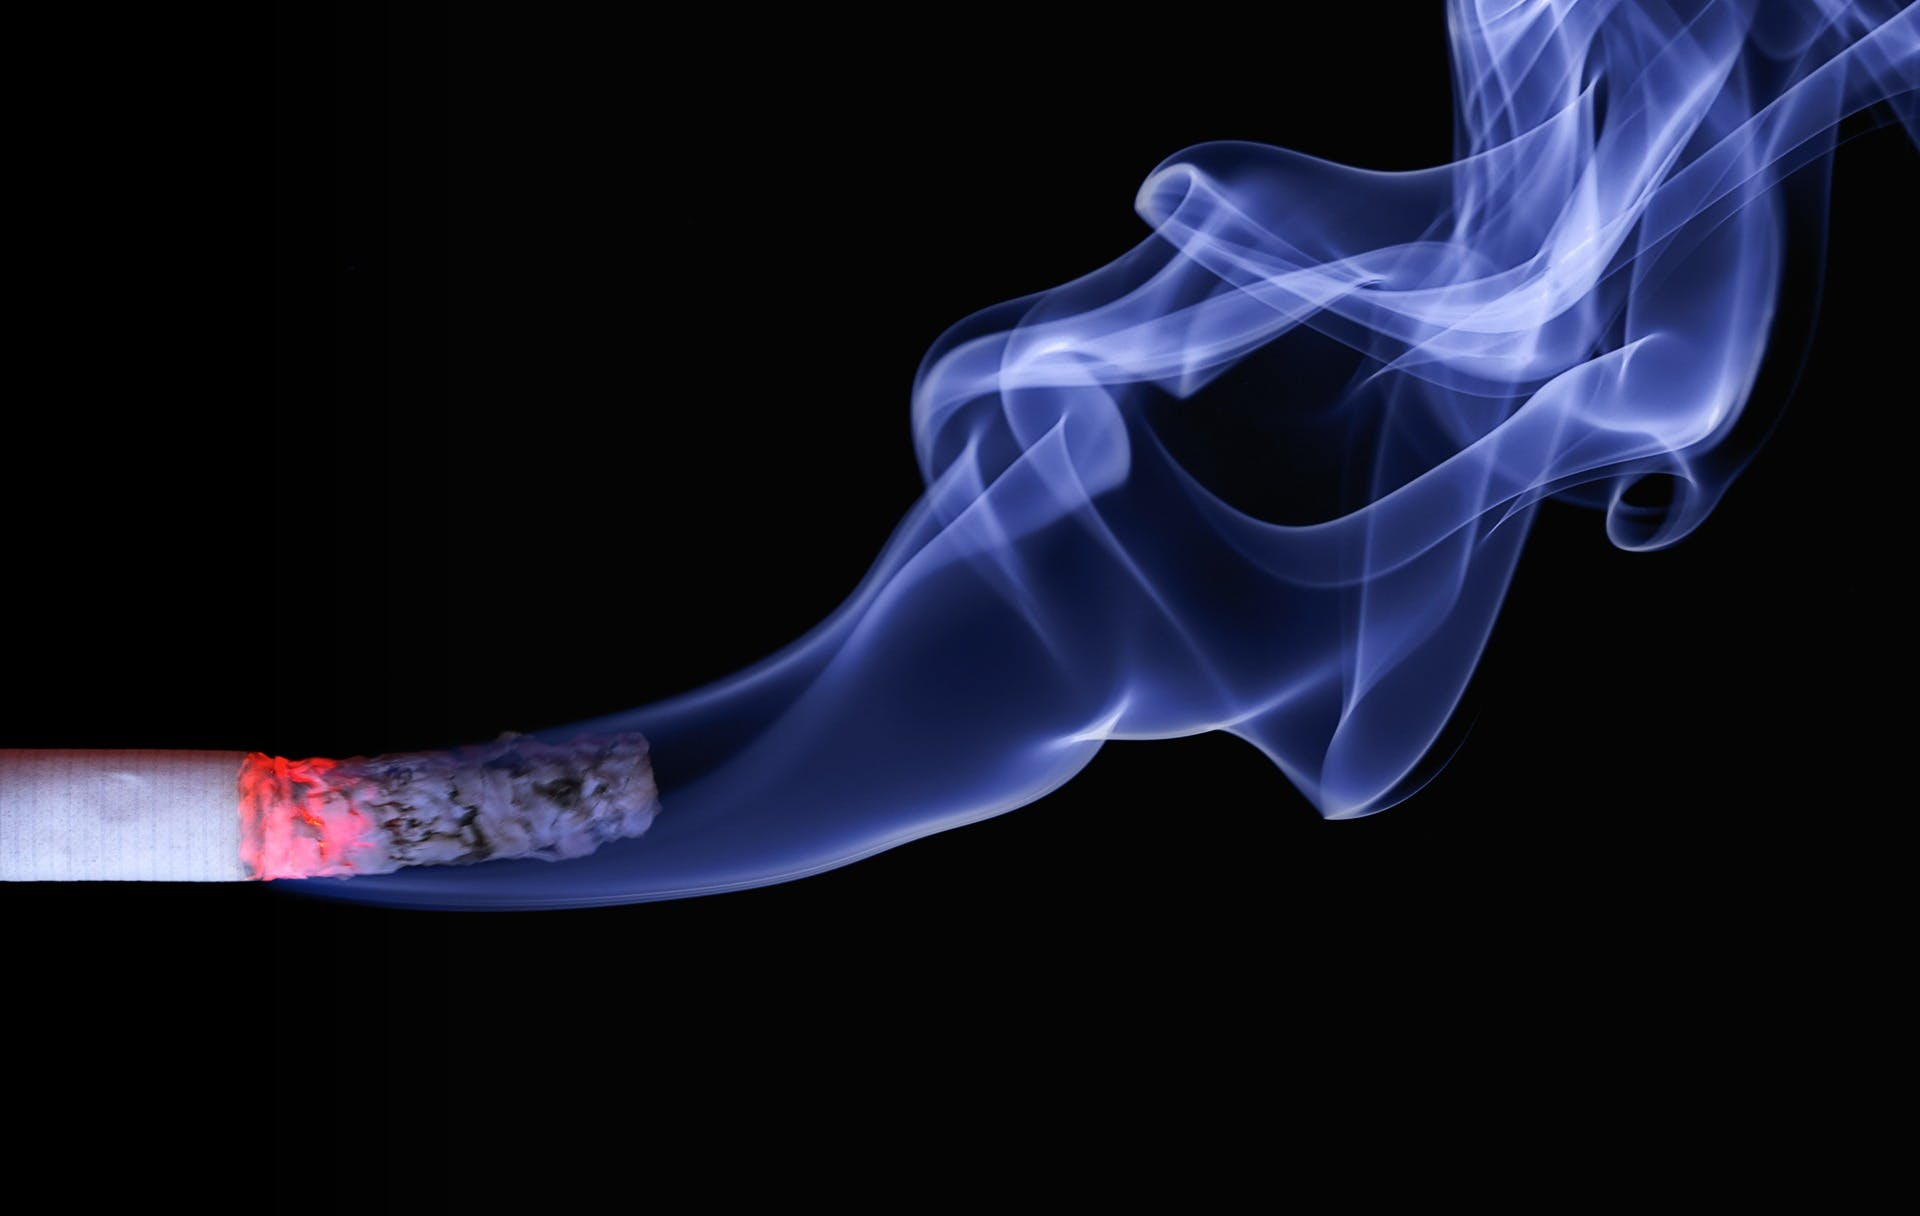 Free stock photo of cigar, cigarette, smoke, macro